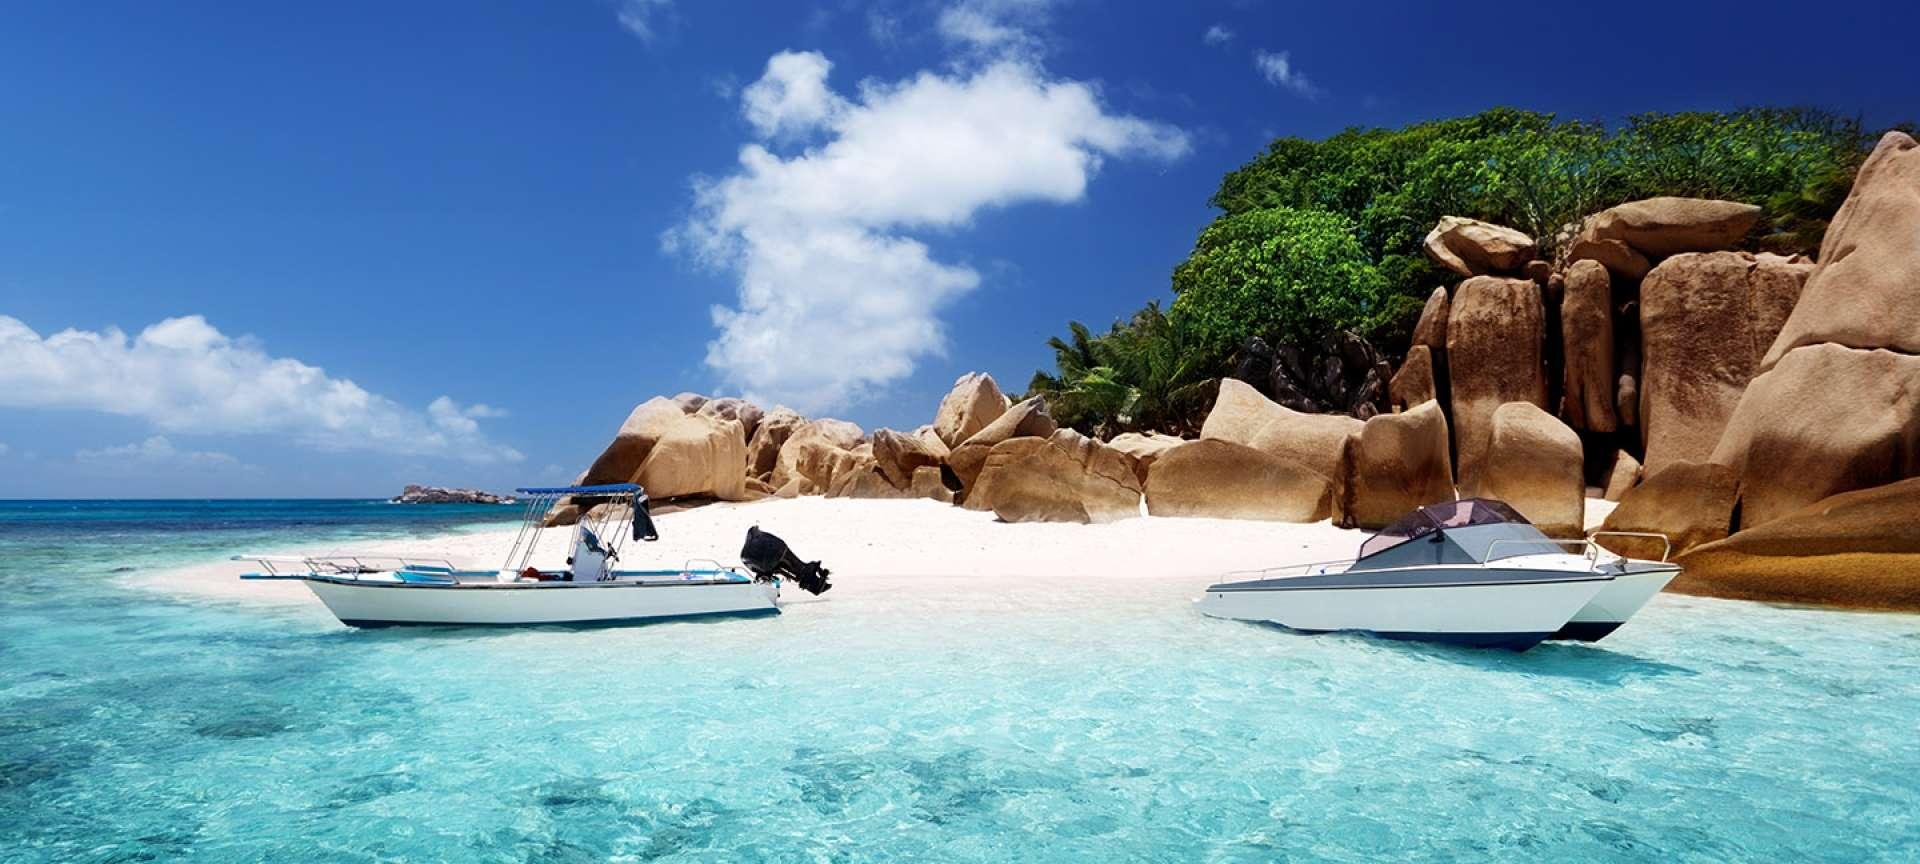 Beach holidays in Madagascar - Africa Wildlife Safaris